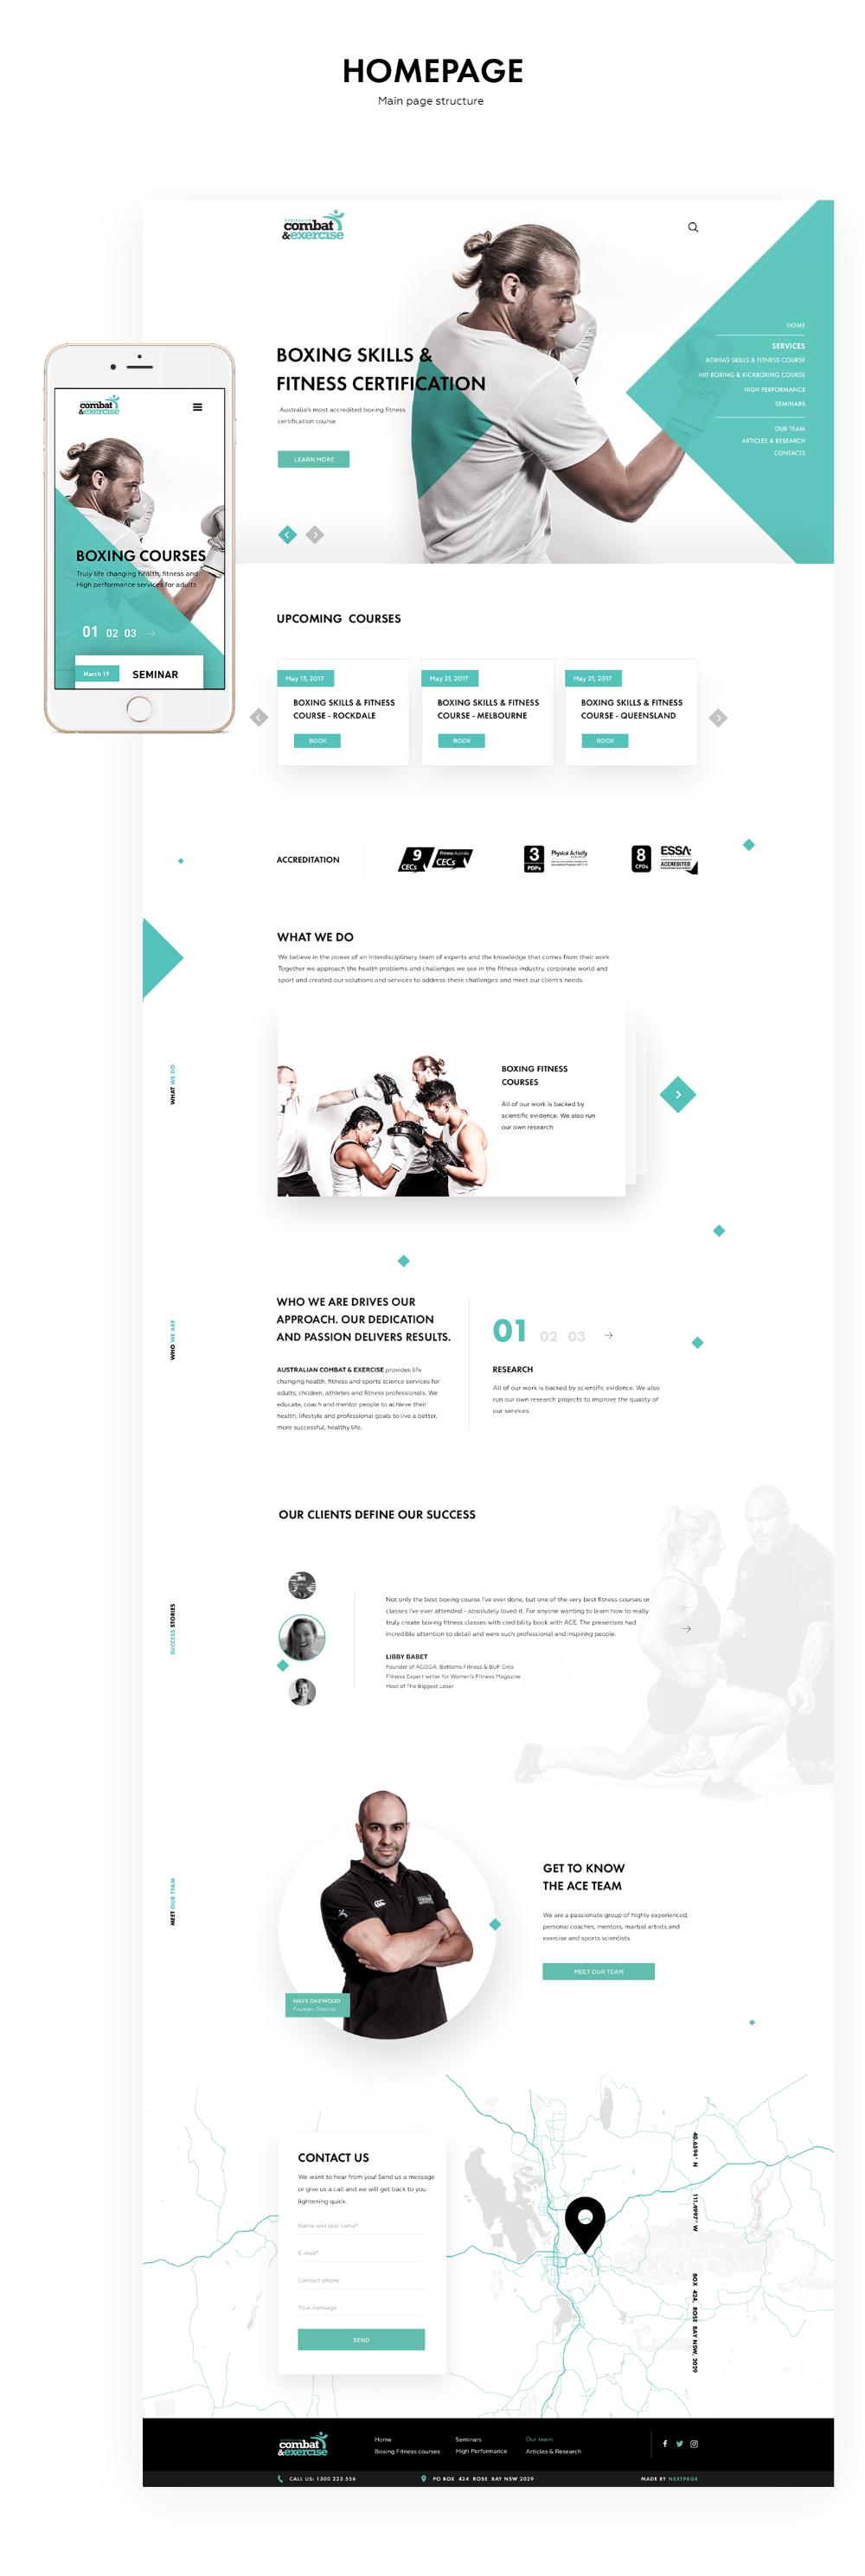 Australian Combat Exercise Website Design On Behance Corporate Website Design Website Design Services Exercise Website